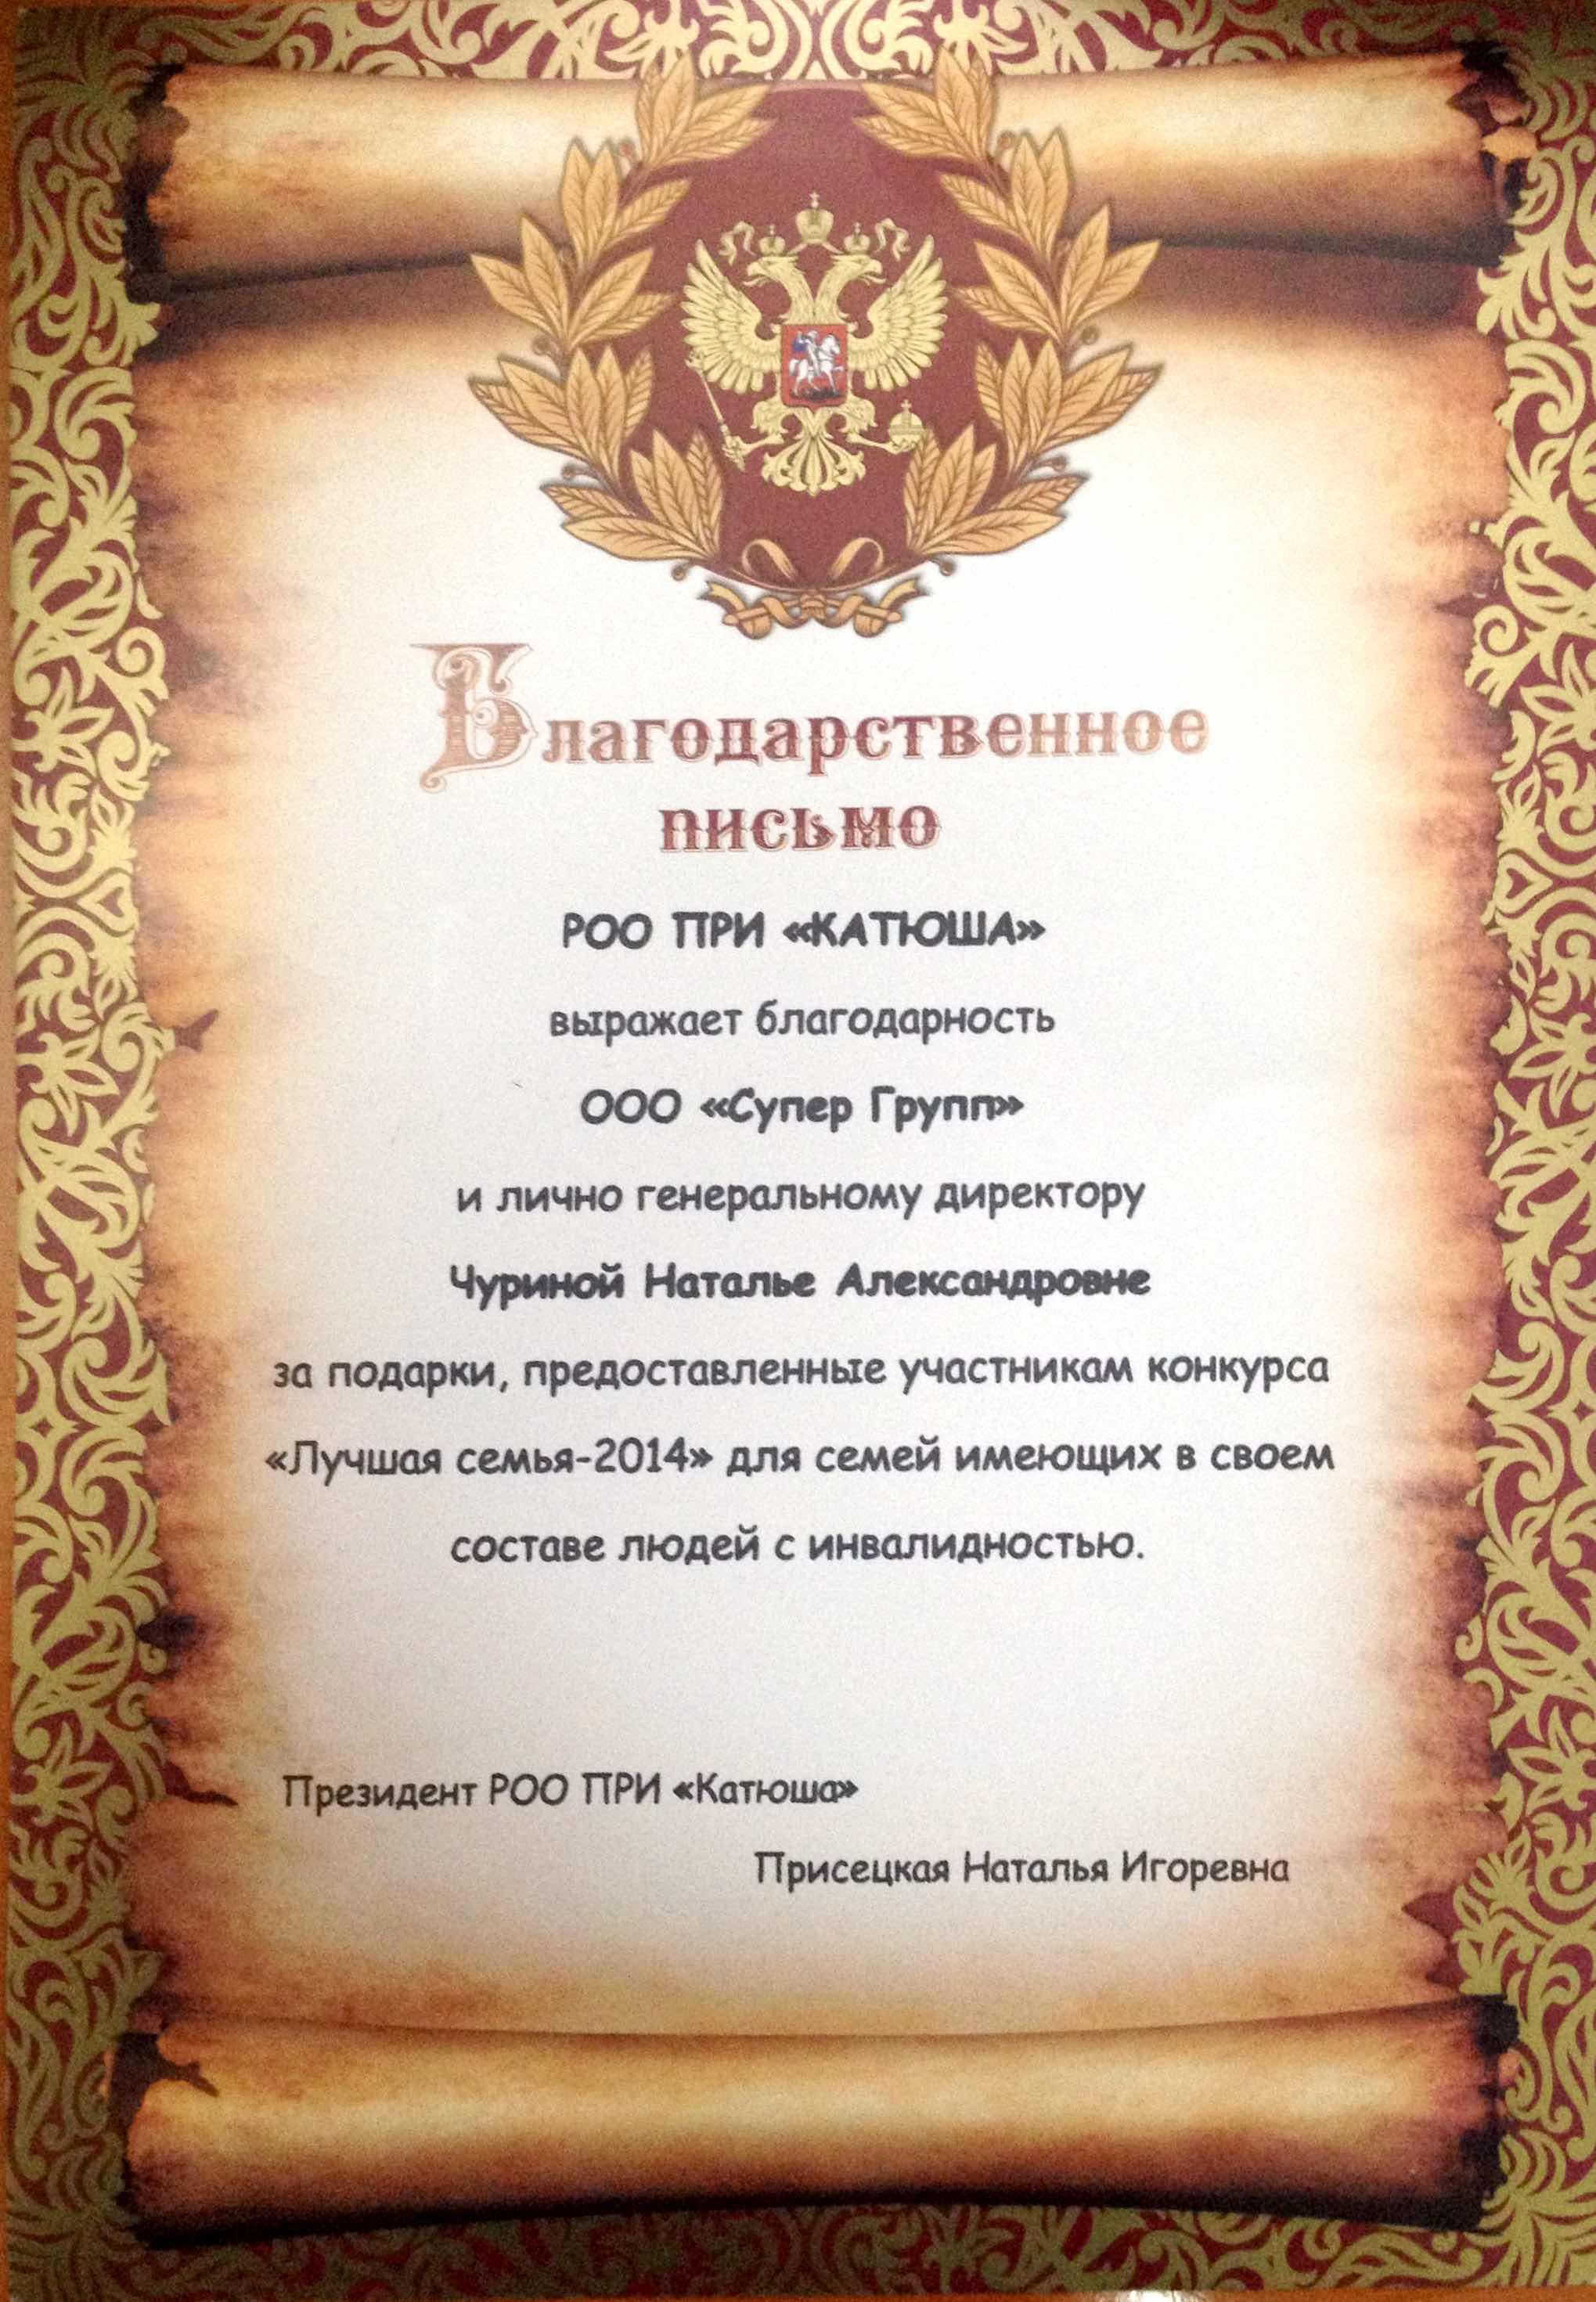 Super-Fartuk.ru - спонсор конкурса